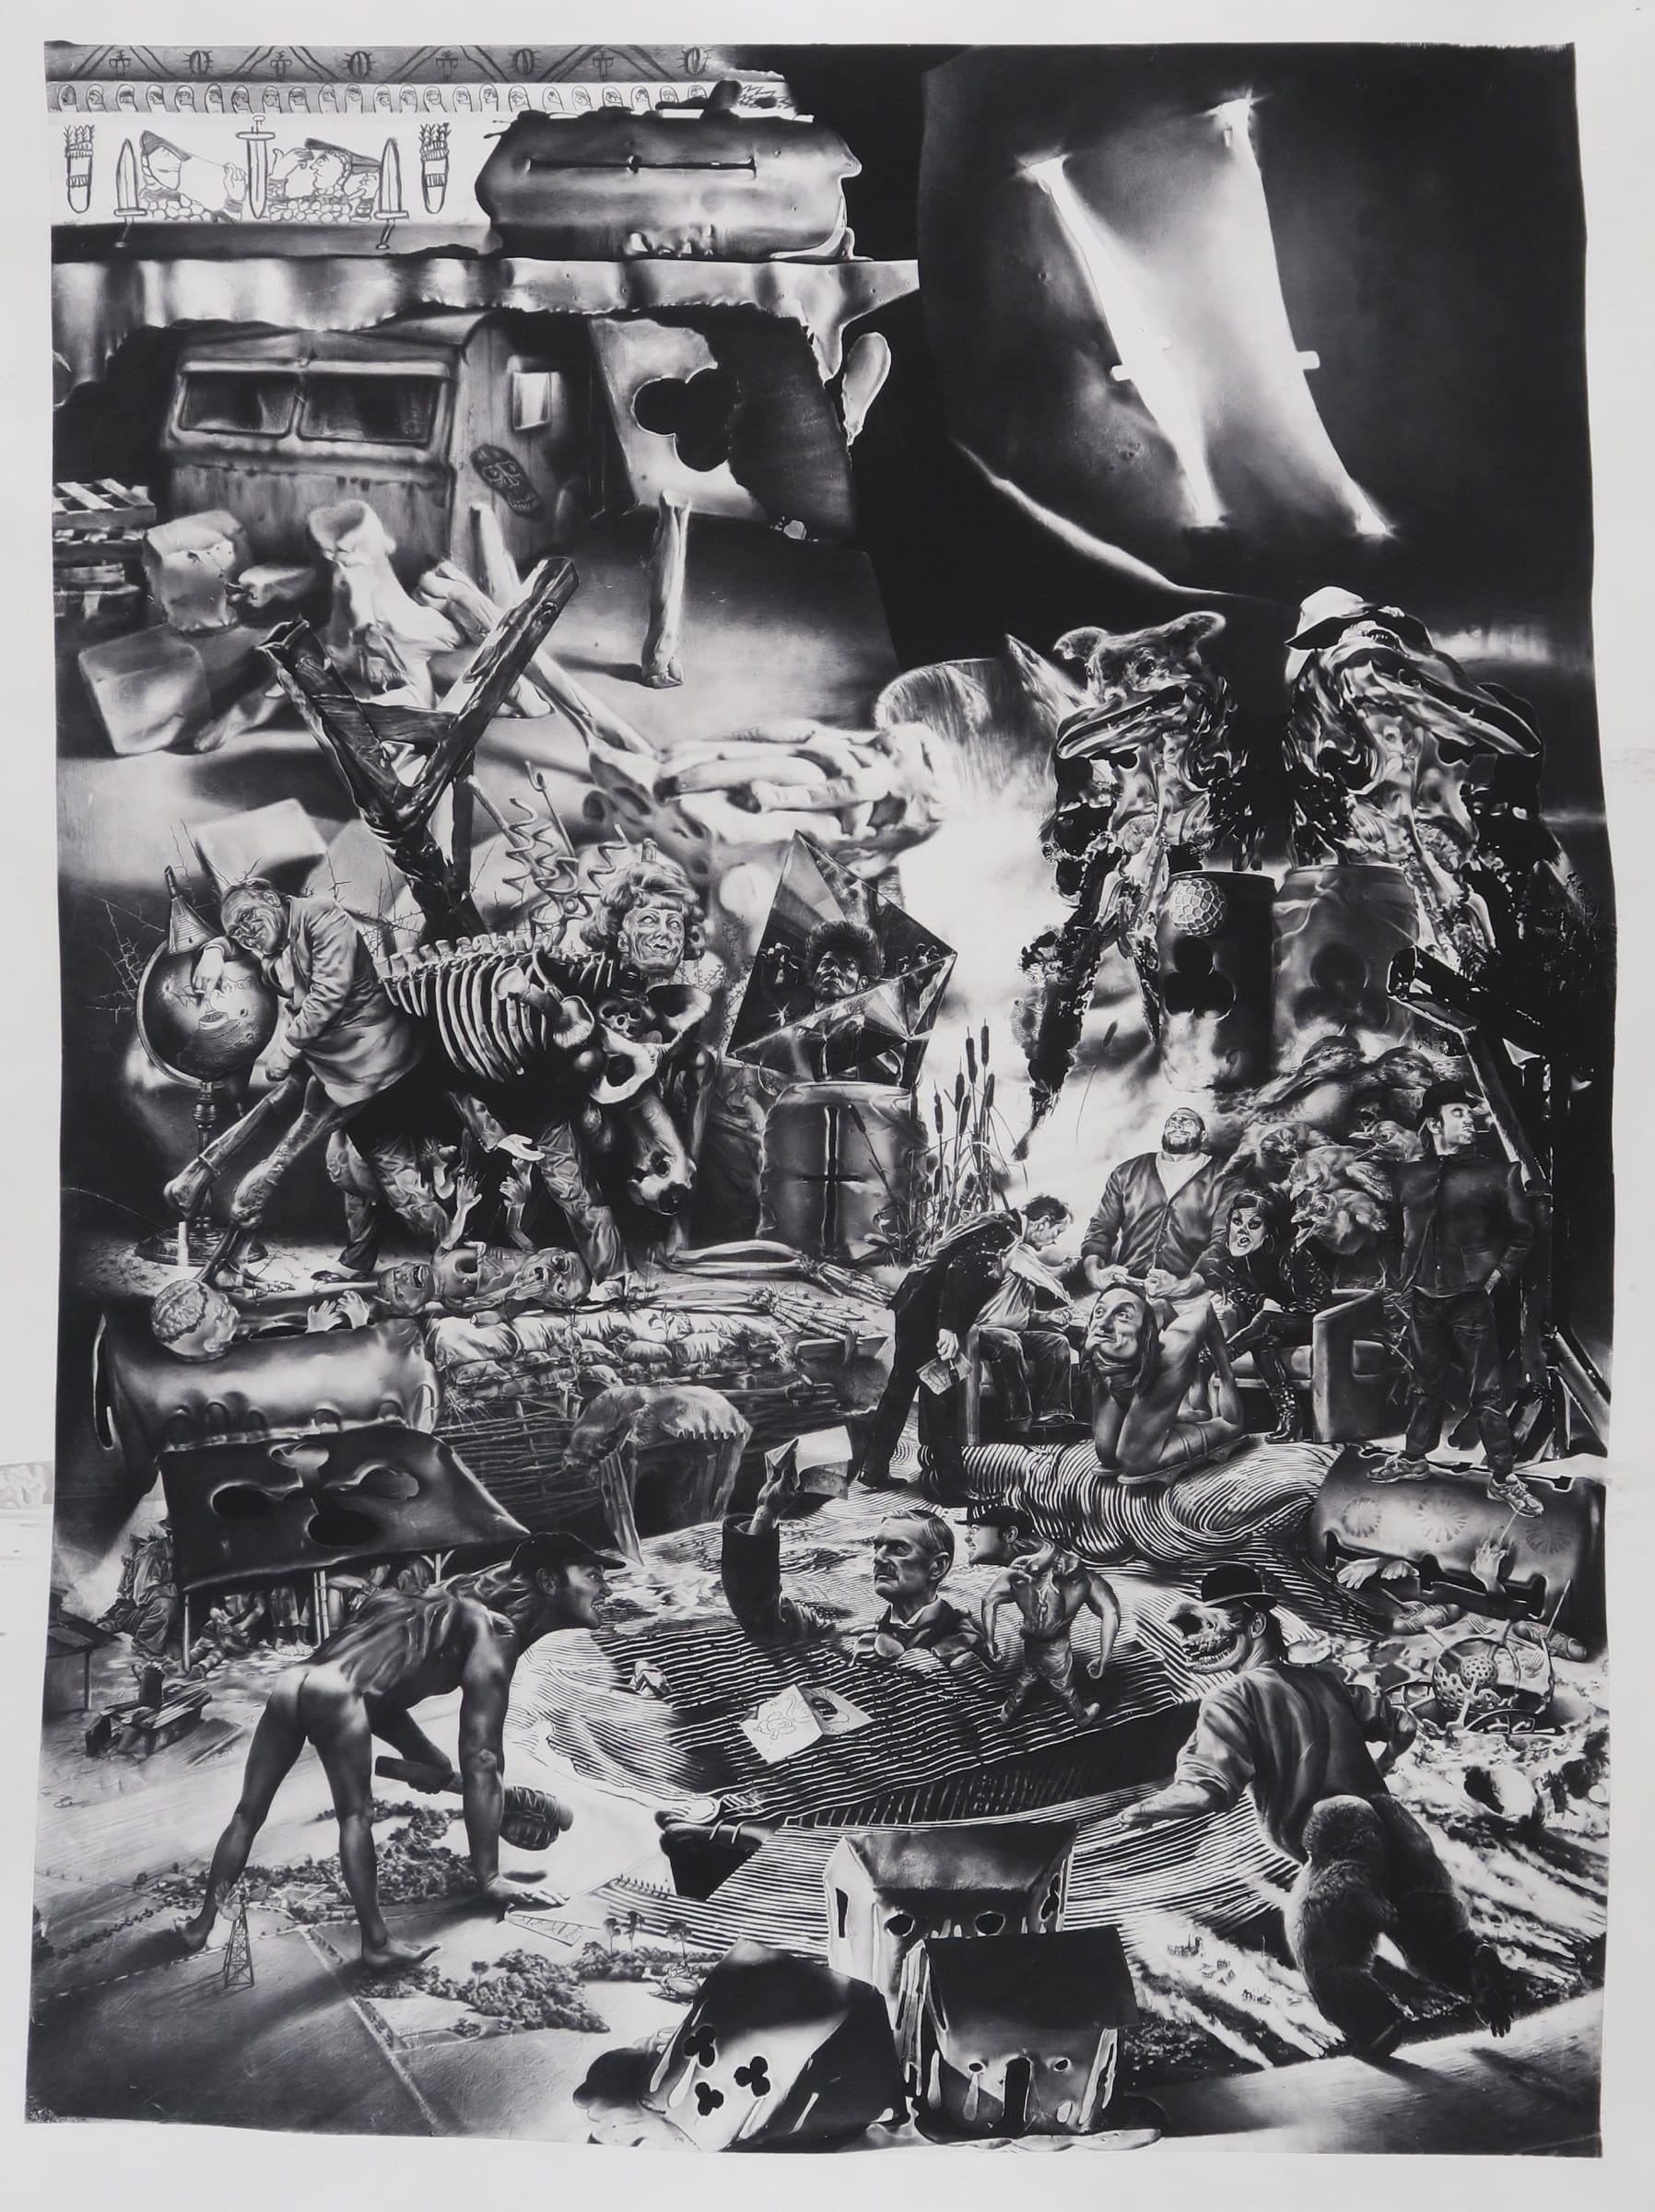 <span class=&#34;link fancybox-details-link&#34;><a href=&#34;/exhibitions/98/works/image2075/&#34;>View Detail Page</a></span><div id=&#34;artwork-panel-details&#34; class=&#34;standard-artwork-details&#34;><div class=&#34;artist&#34;><strong>Robert McNally</strong></div><div class=&#34;title&#34;><em>&#194;nnus Horribilis</em>, 2016</div><div class=&#34;dimensions&#34;>90.4 x 68.4 x 20 cm<br /> 35 5/8 x 26 7/8 x 7 7/8 in<br /> Framed within a lightbox</div></div>